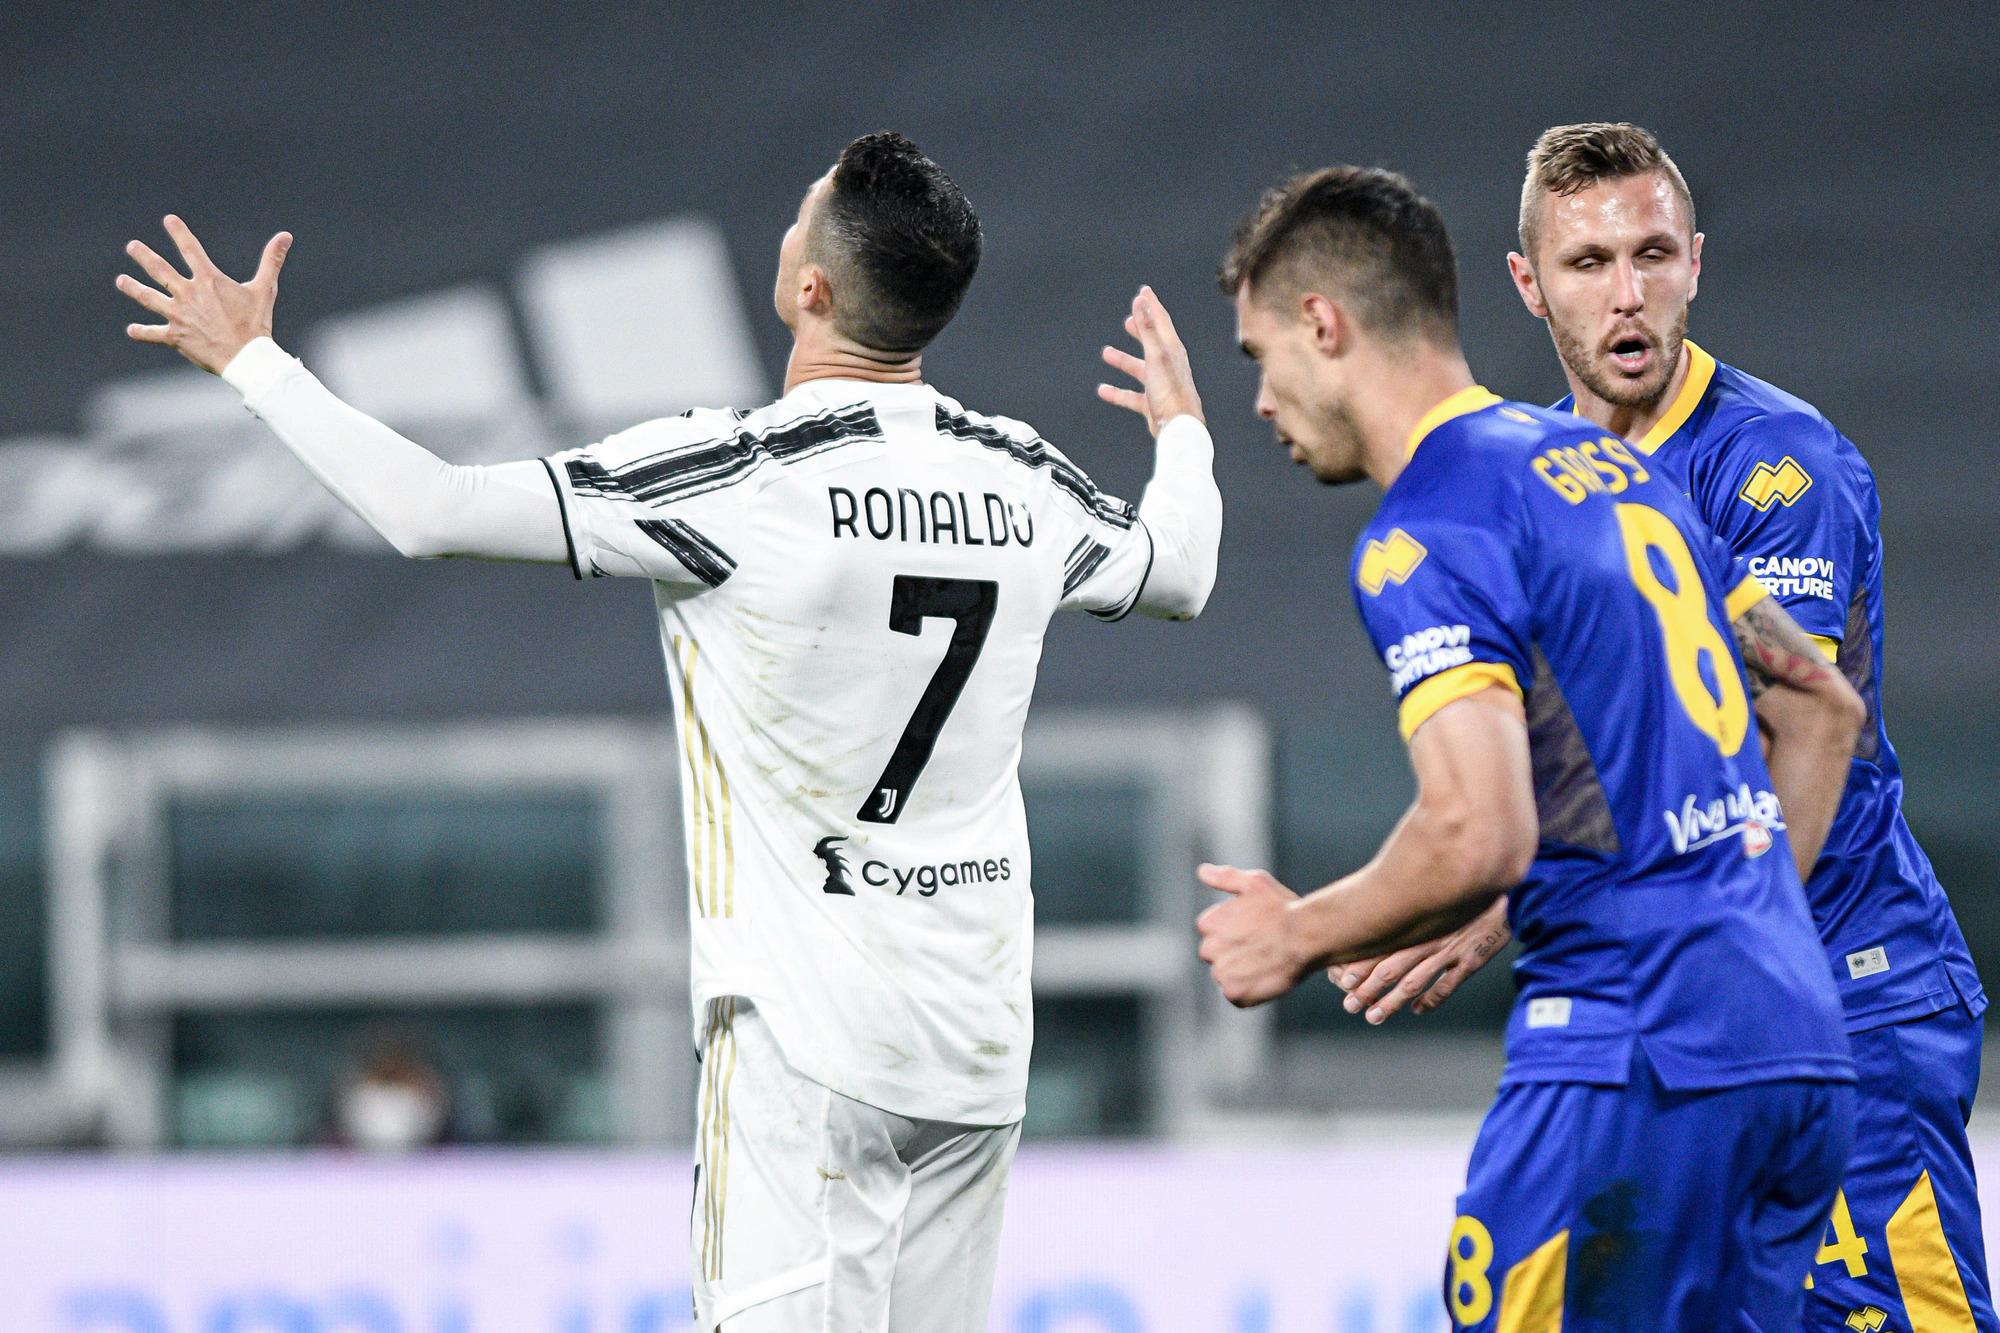 Ronaldo kesal usai pertandingan buruk di awal kemenangan melawan Parma pada 21 April.  Foto: Lapresse